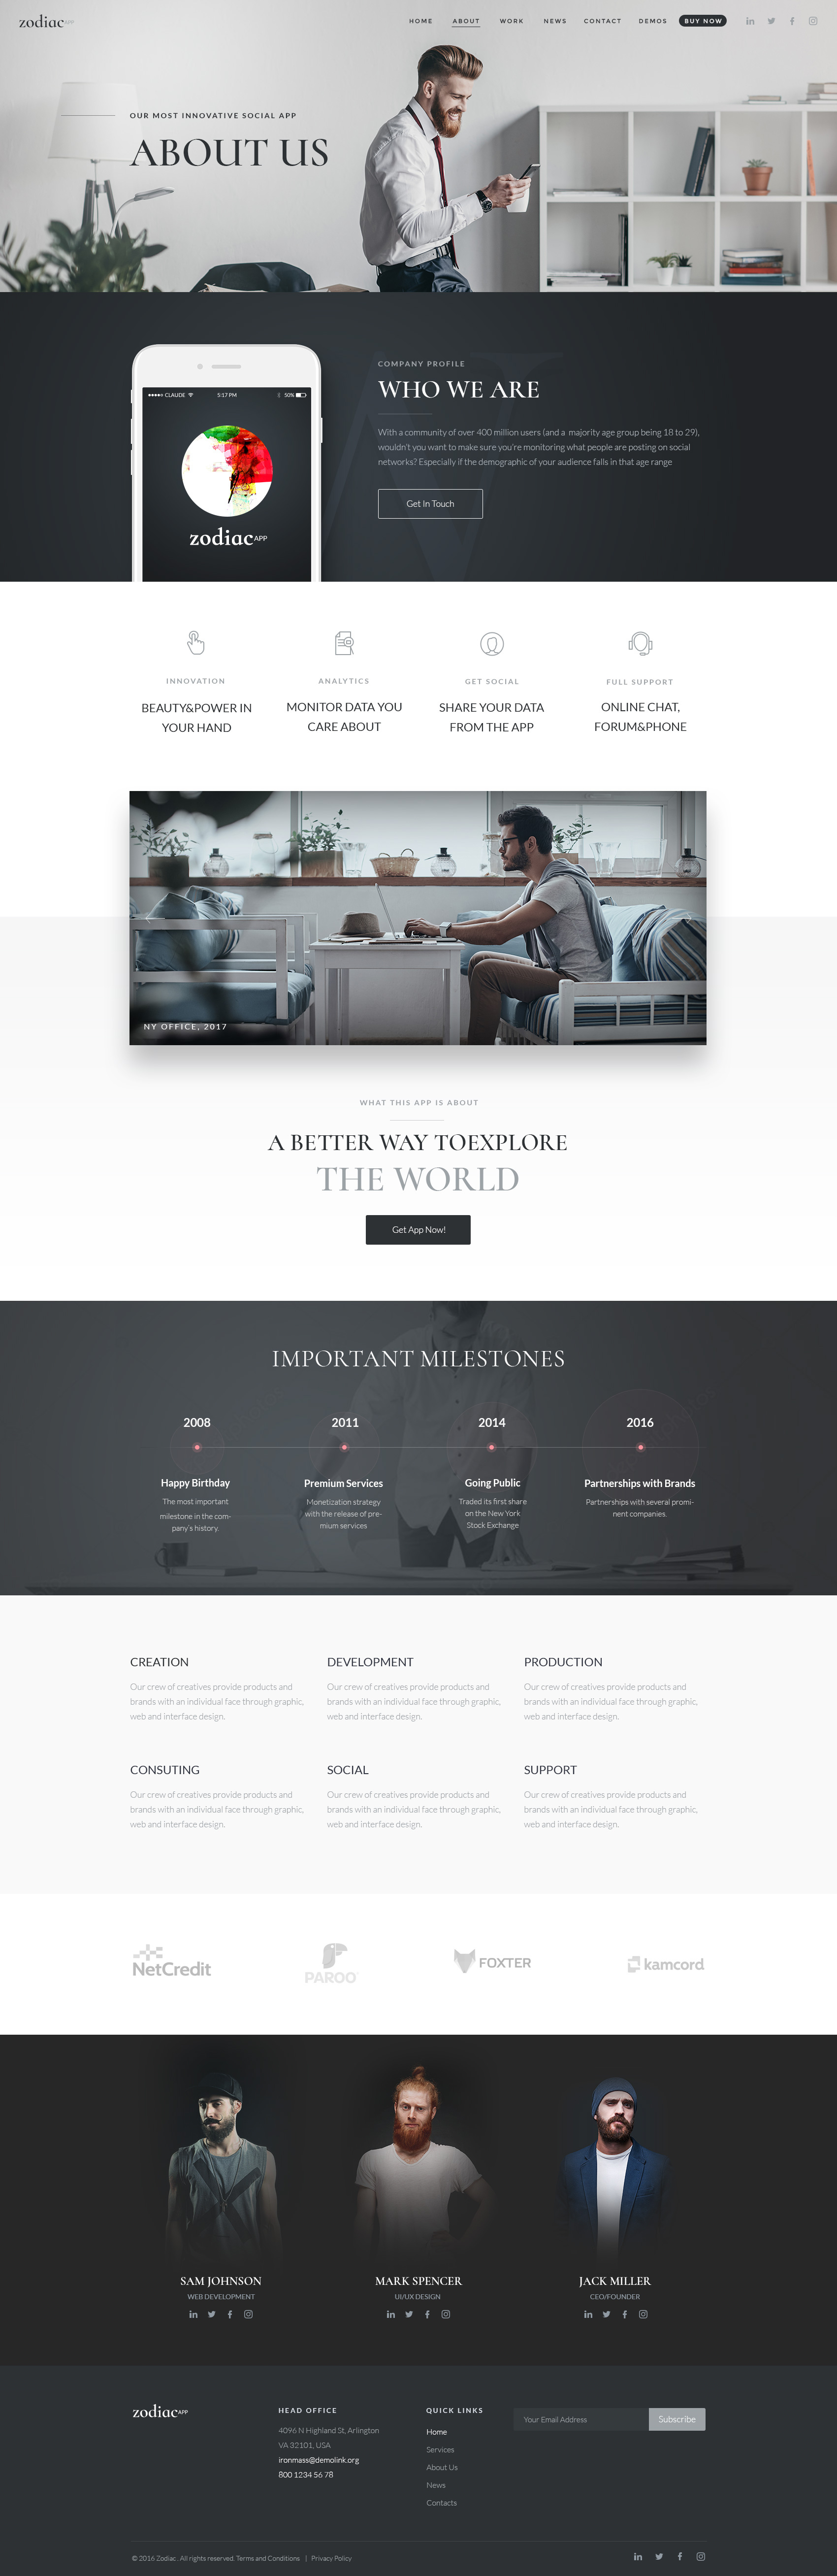 Zodiac Theme App Layout Web Design Beautiful Web Design Great Website Design